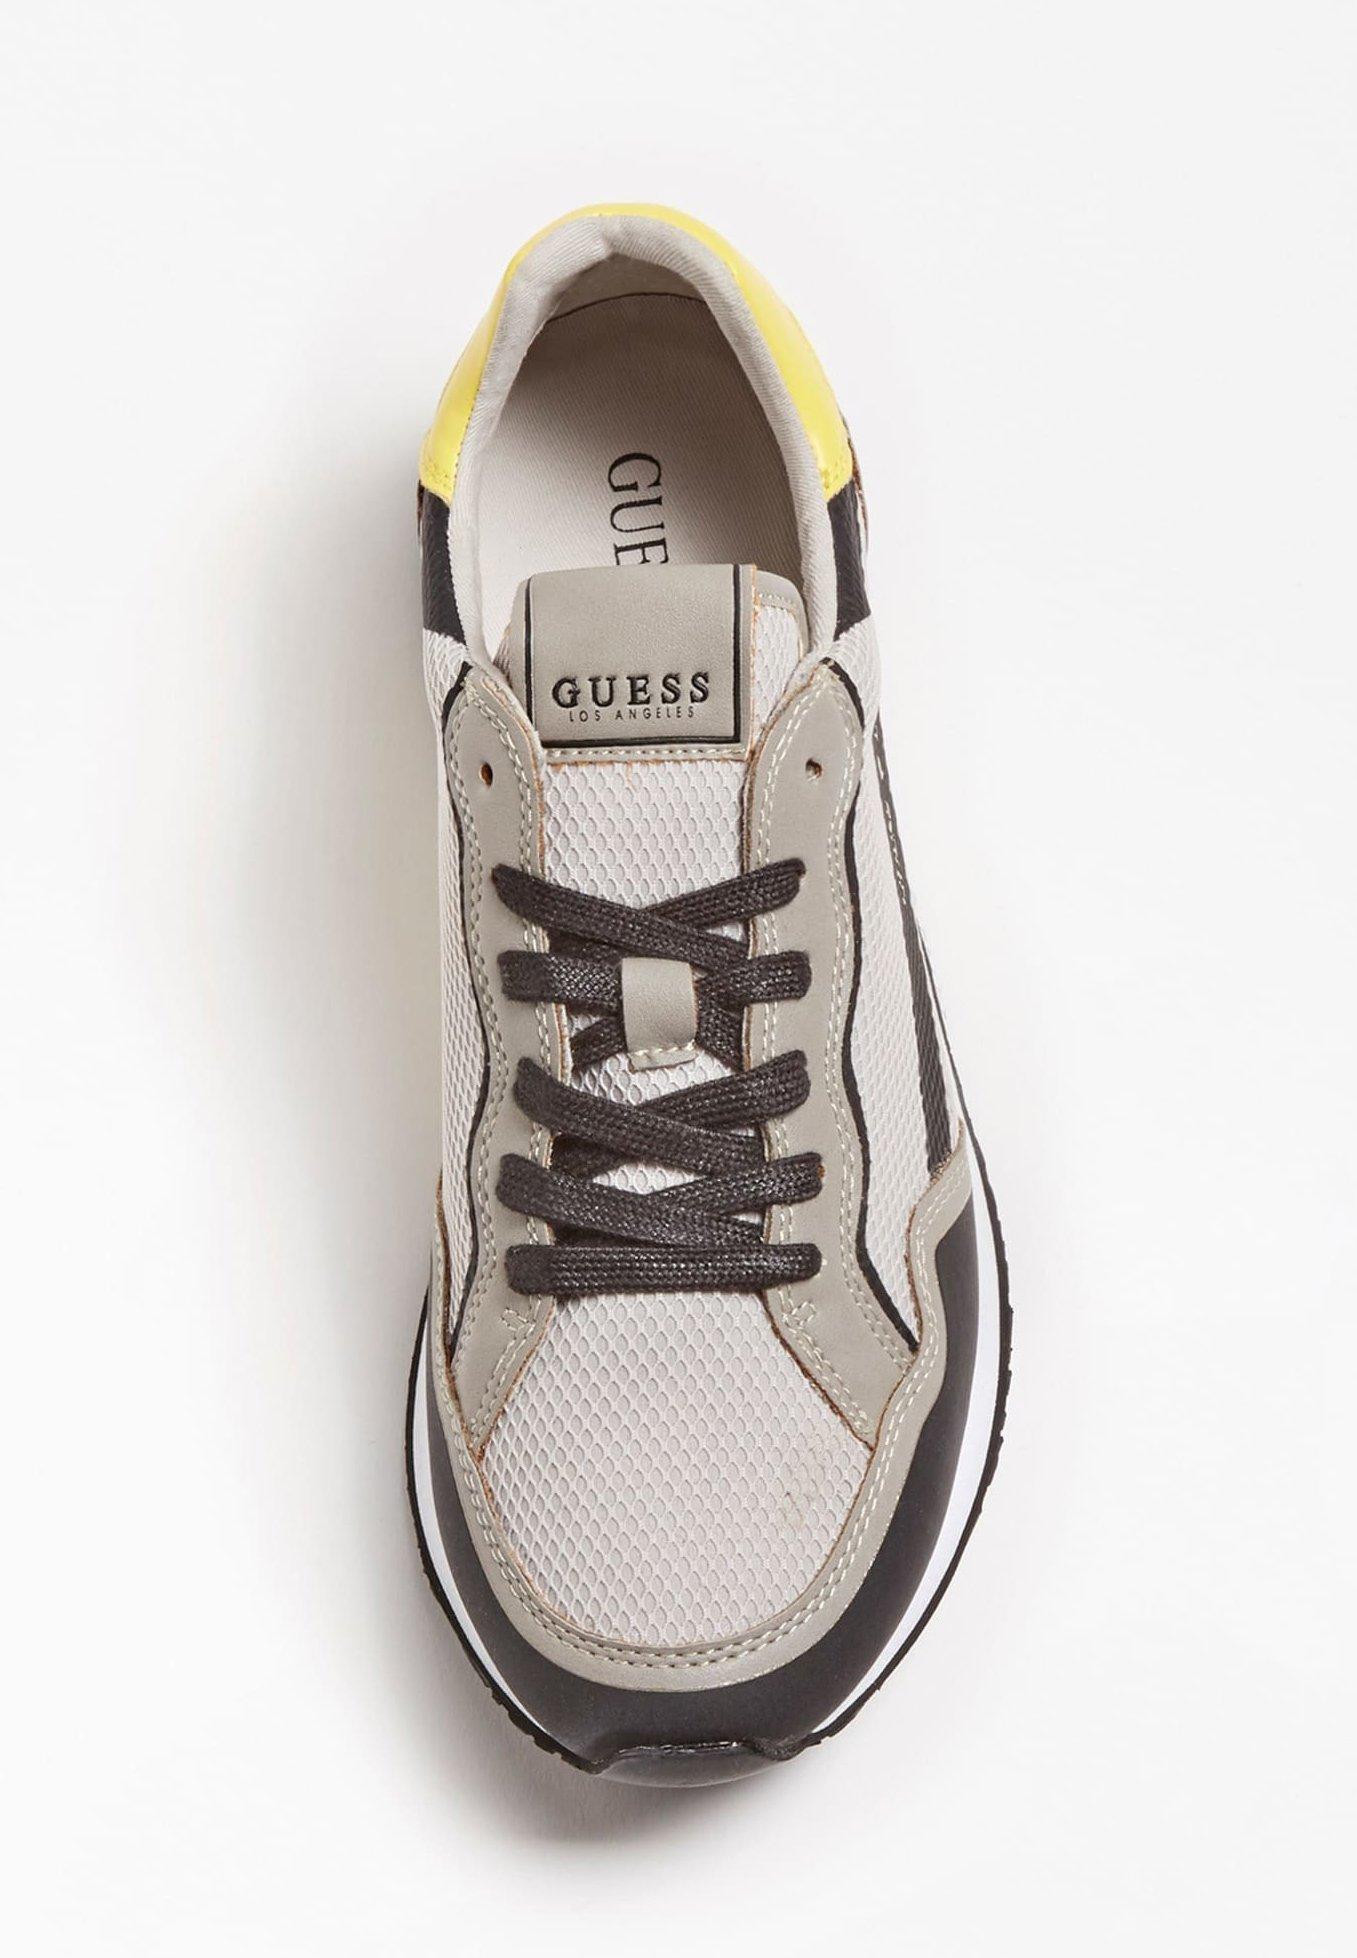 Guess A$AP ROCKY - Sneaker low - mehrfarbig grau/grau - Herrenschuhe 5fqvR